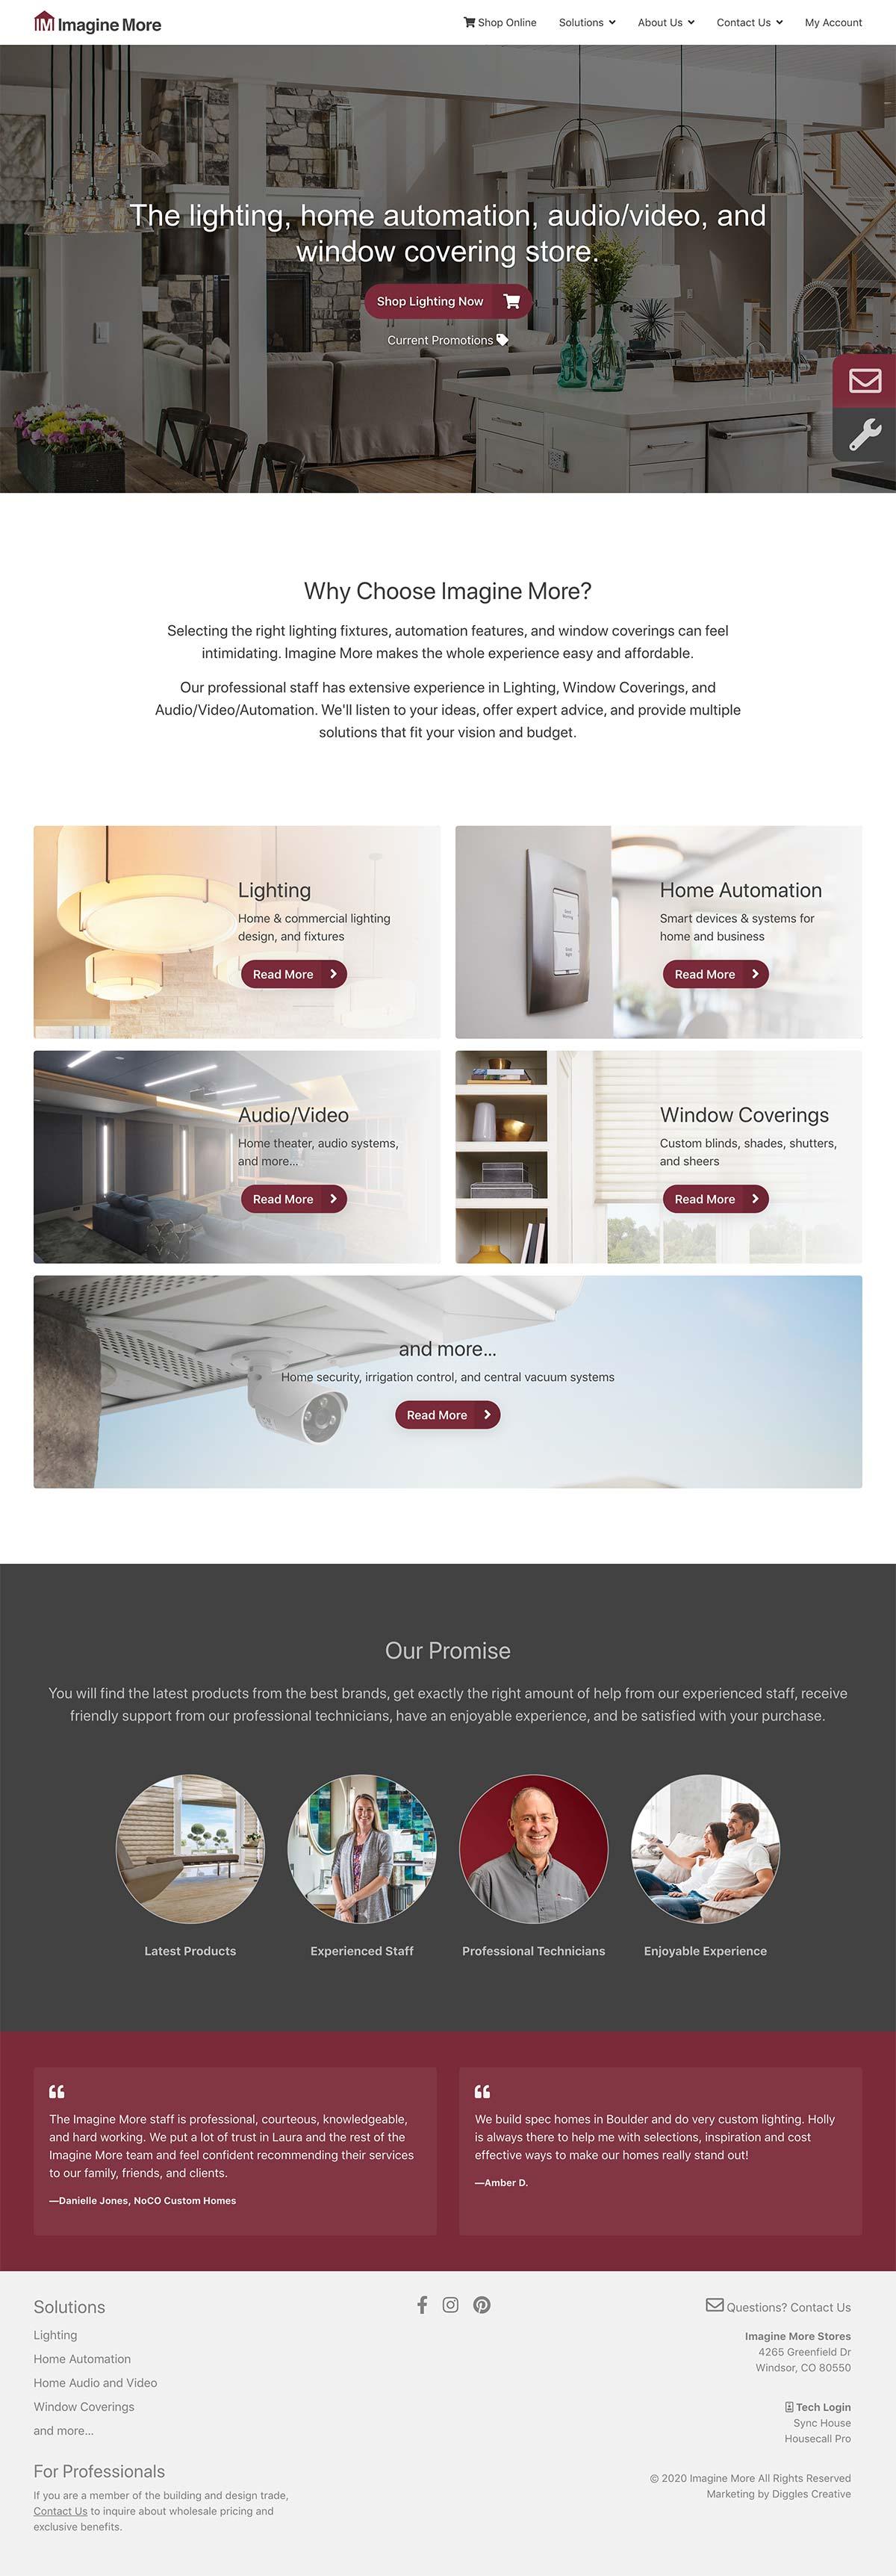 Imagine More - Home Improvement Services Website Design